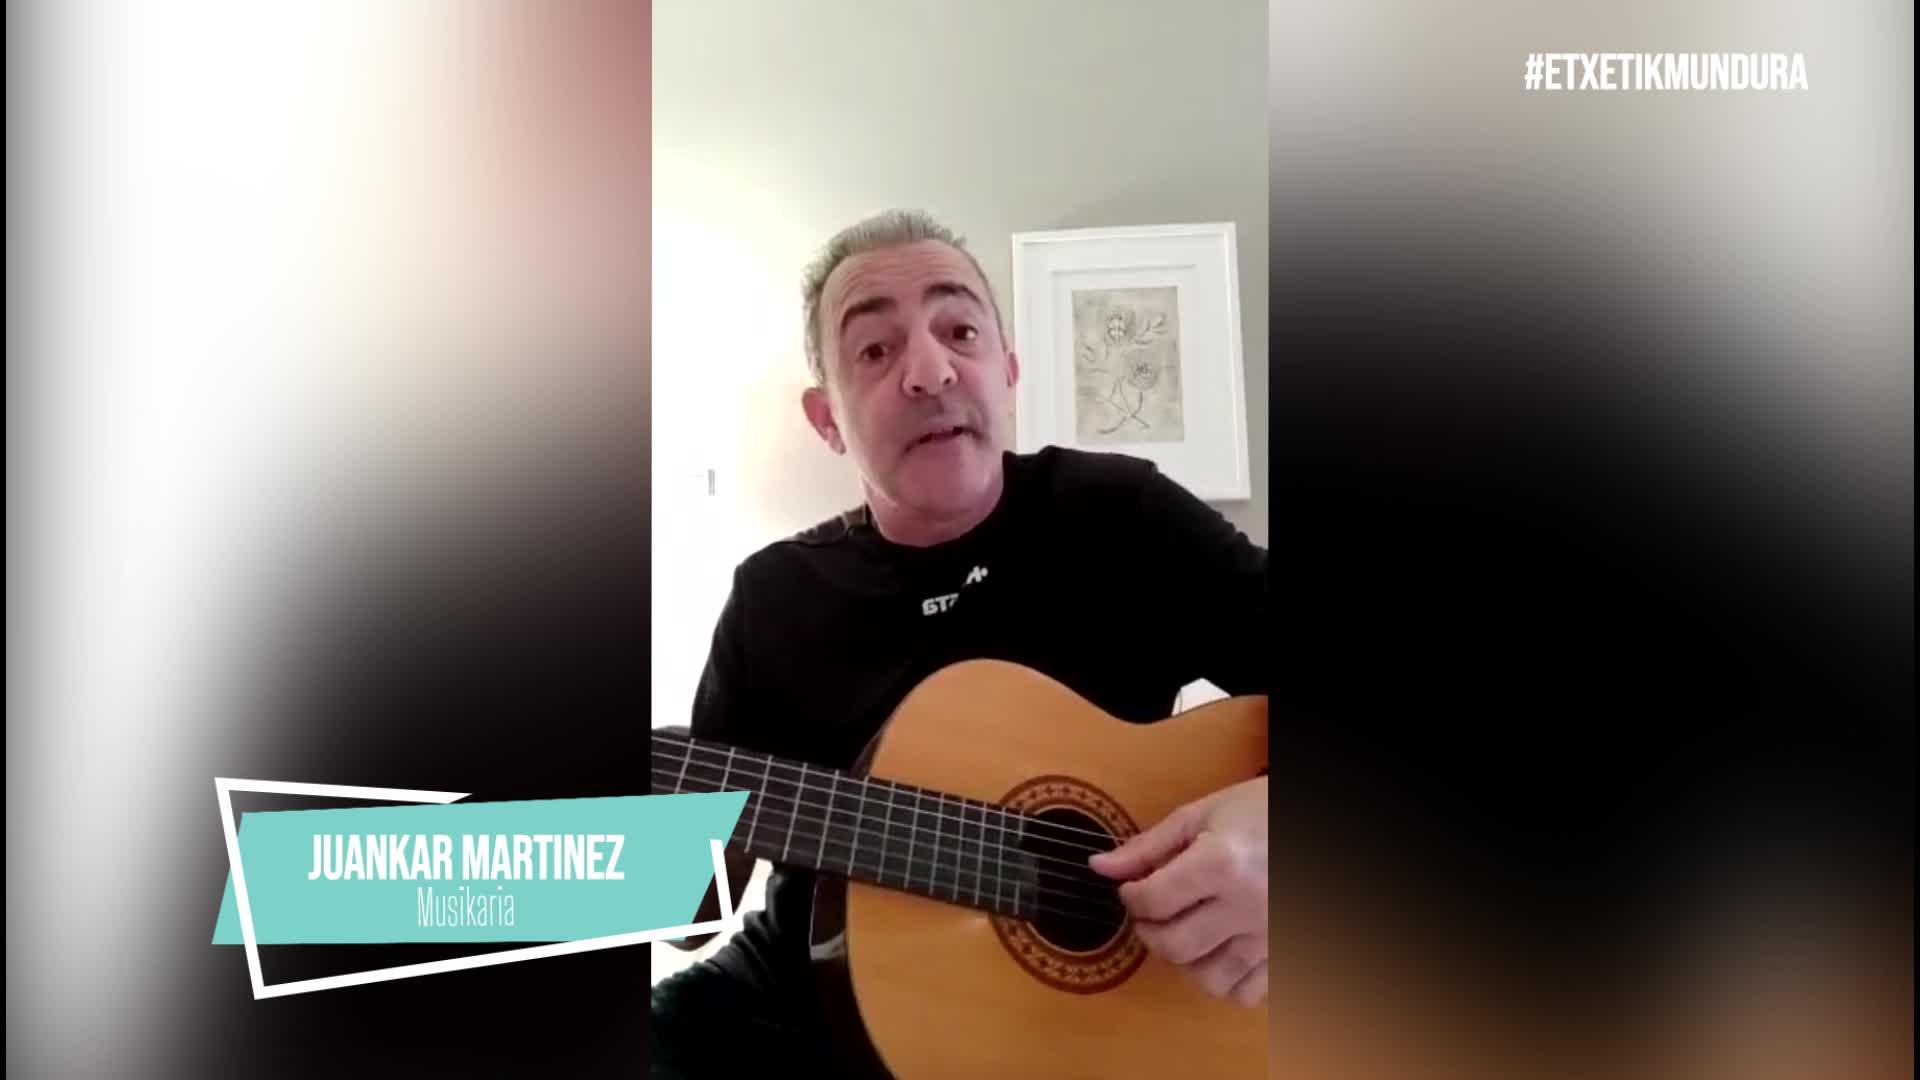 Juankar Martinez musikaria, etxetik mundura